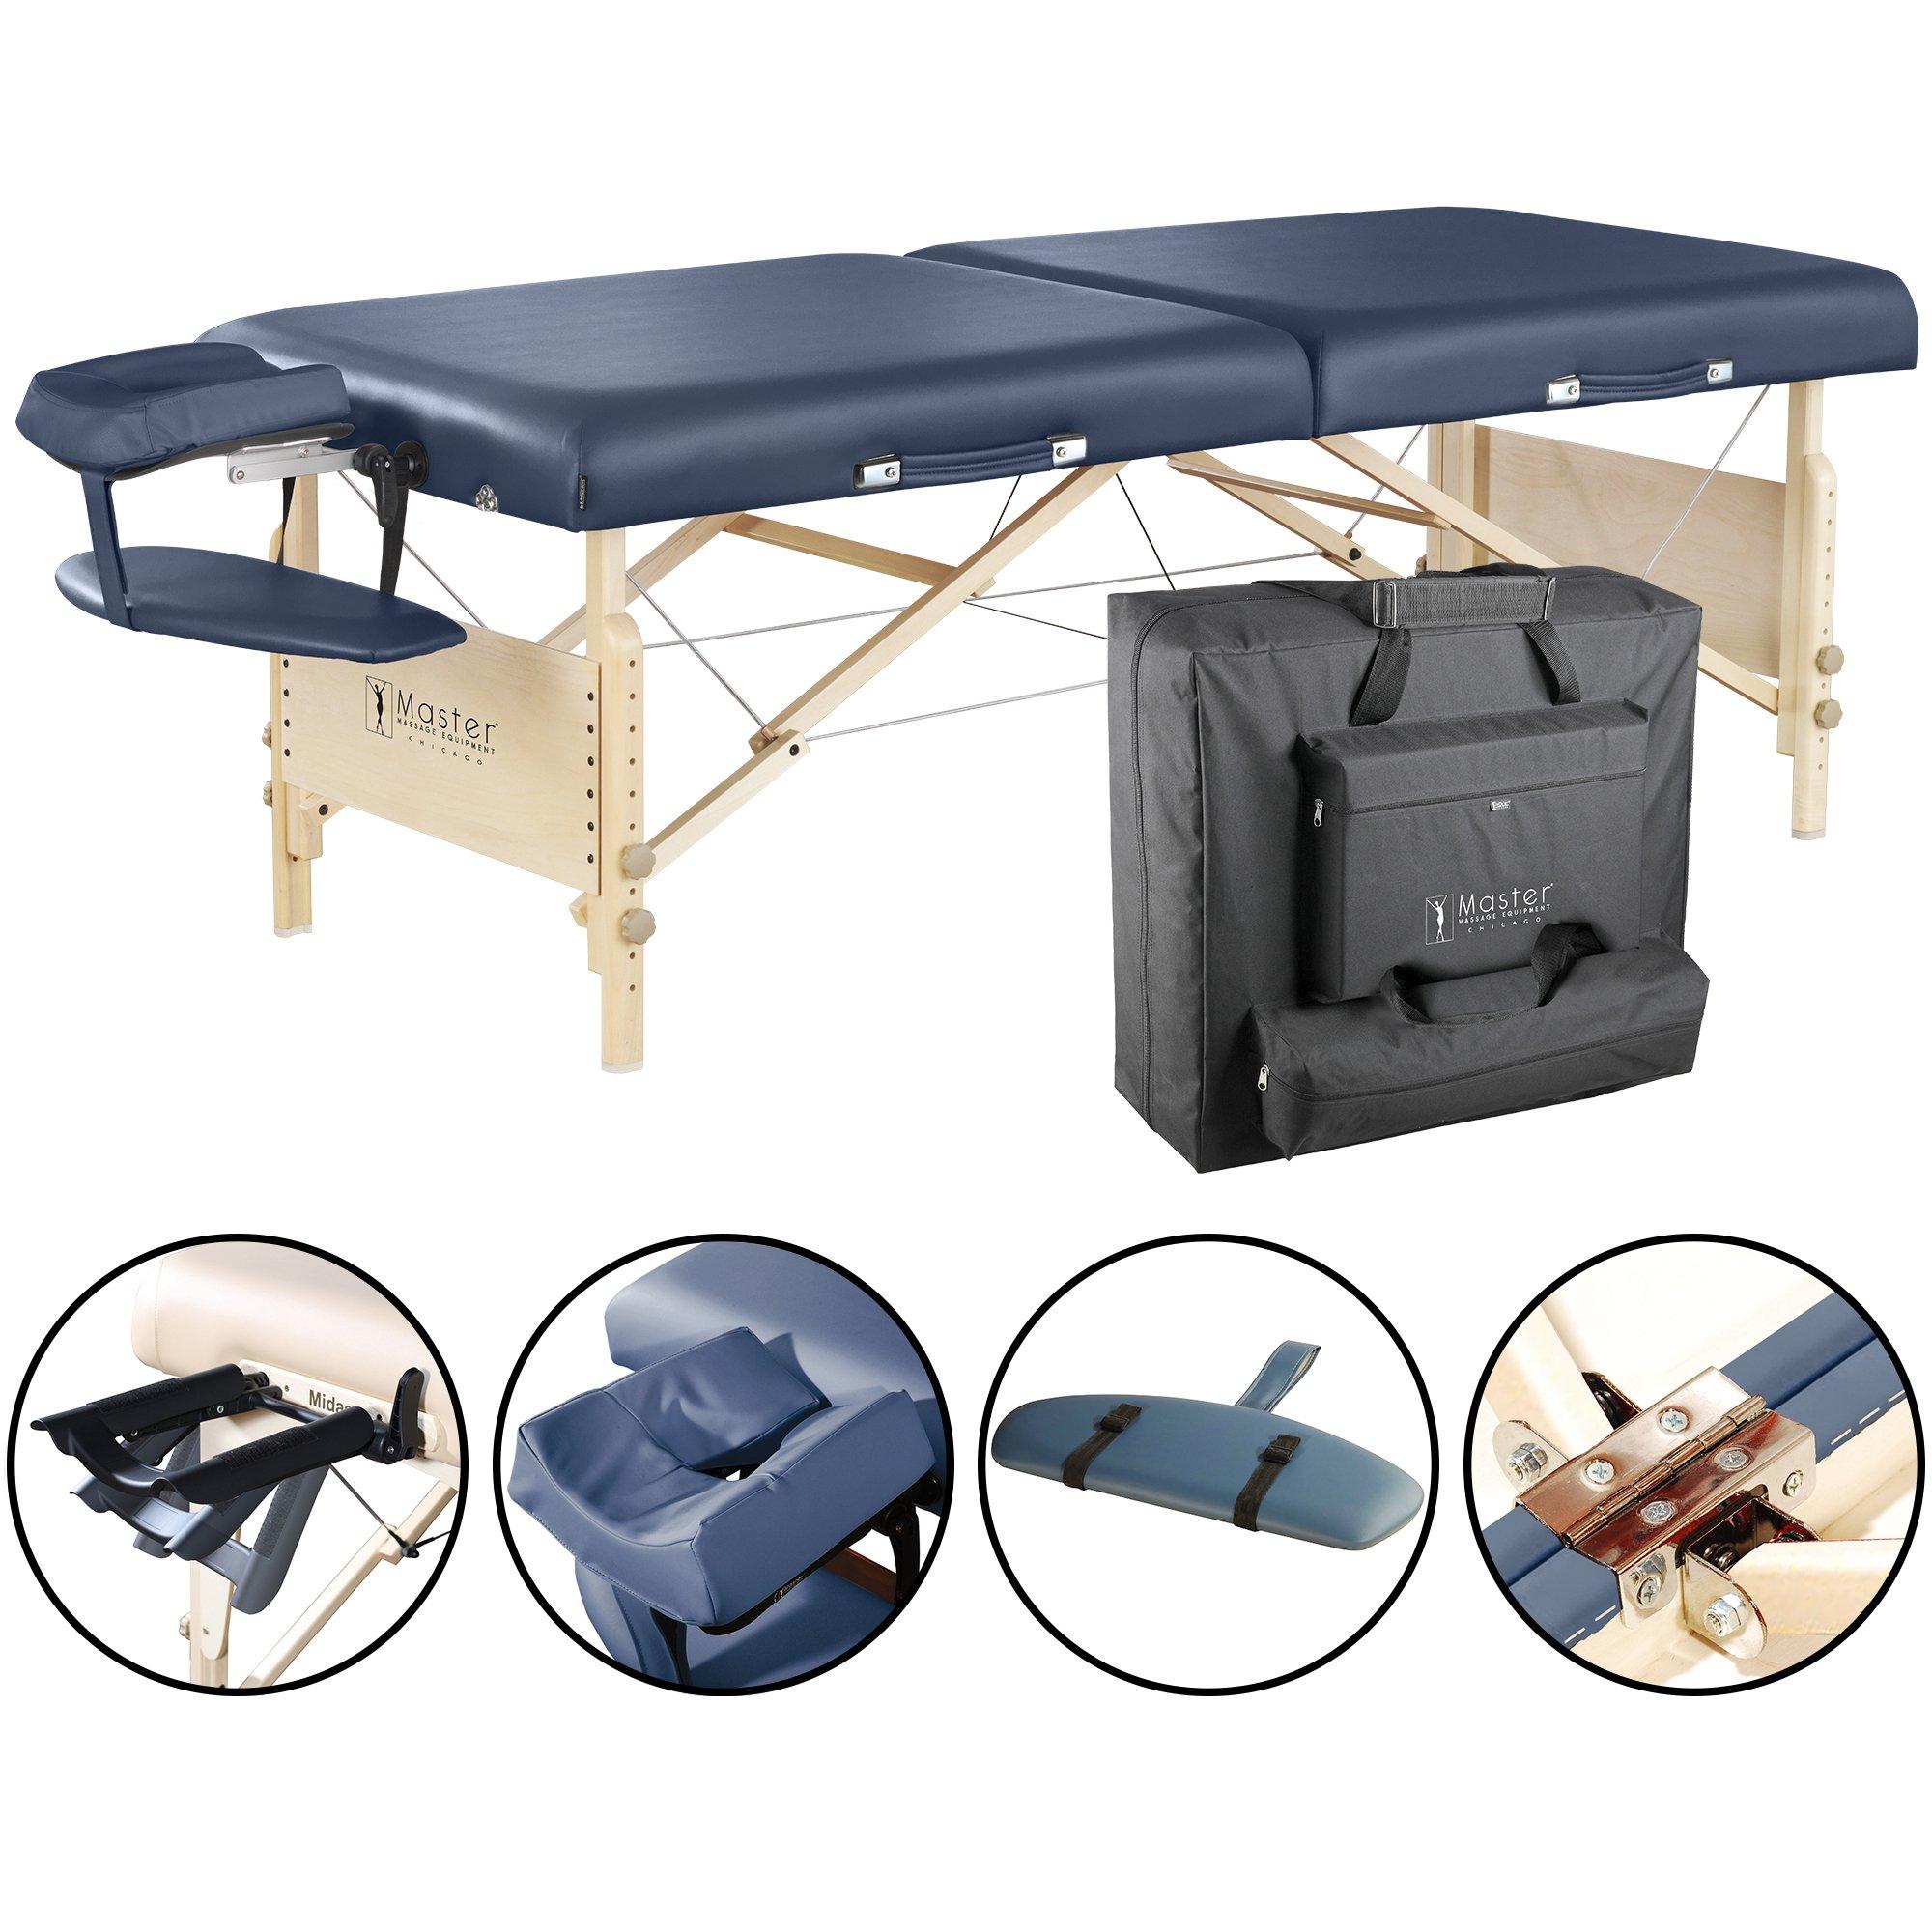 Master Massage 30'' Coronado Portable Massage Table Package, Royal Blue